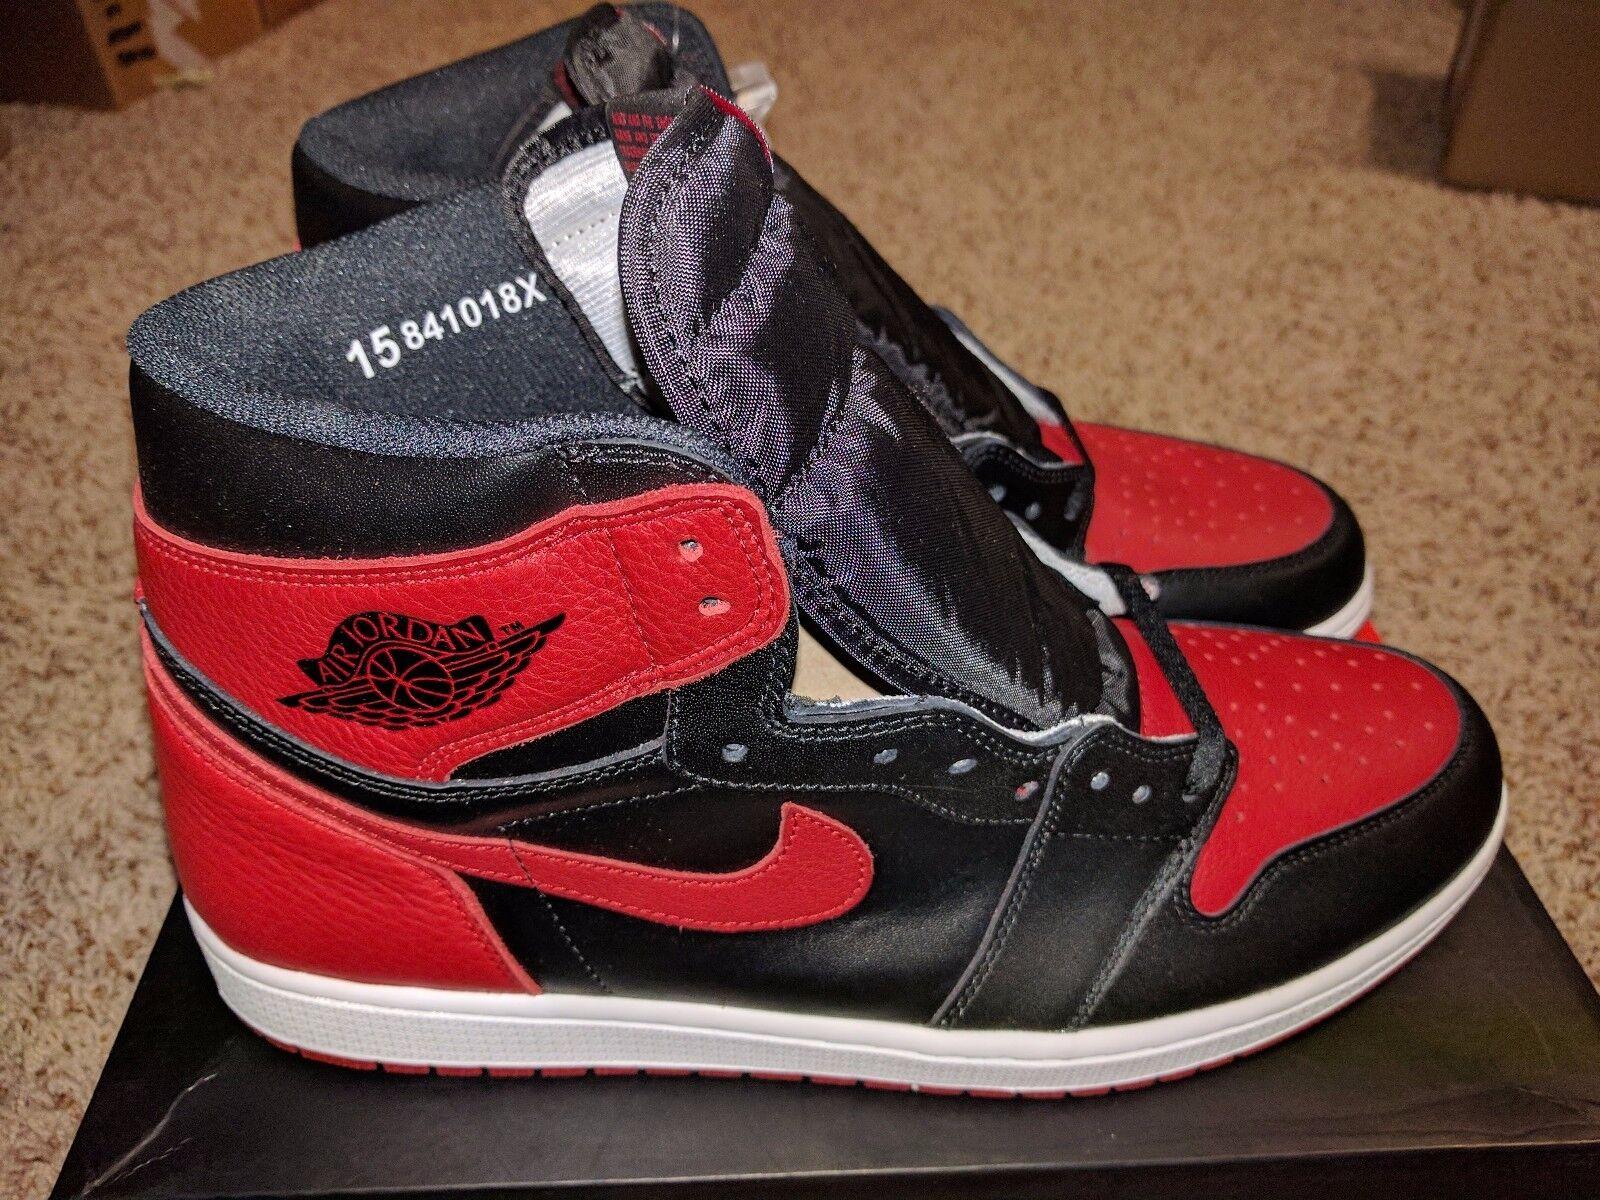 Nike Air Jordan 1 High Bred Black Varsity Red Retro 555088-001 NEW 2016 Size 15